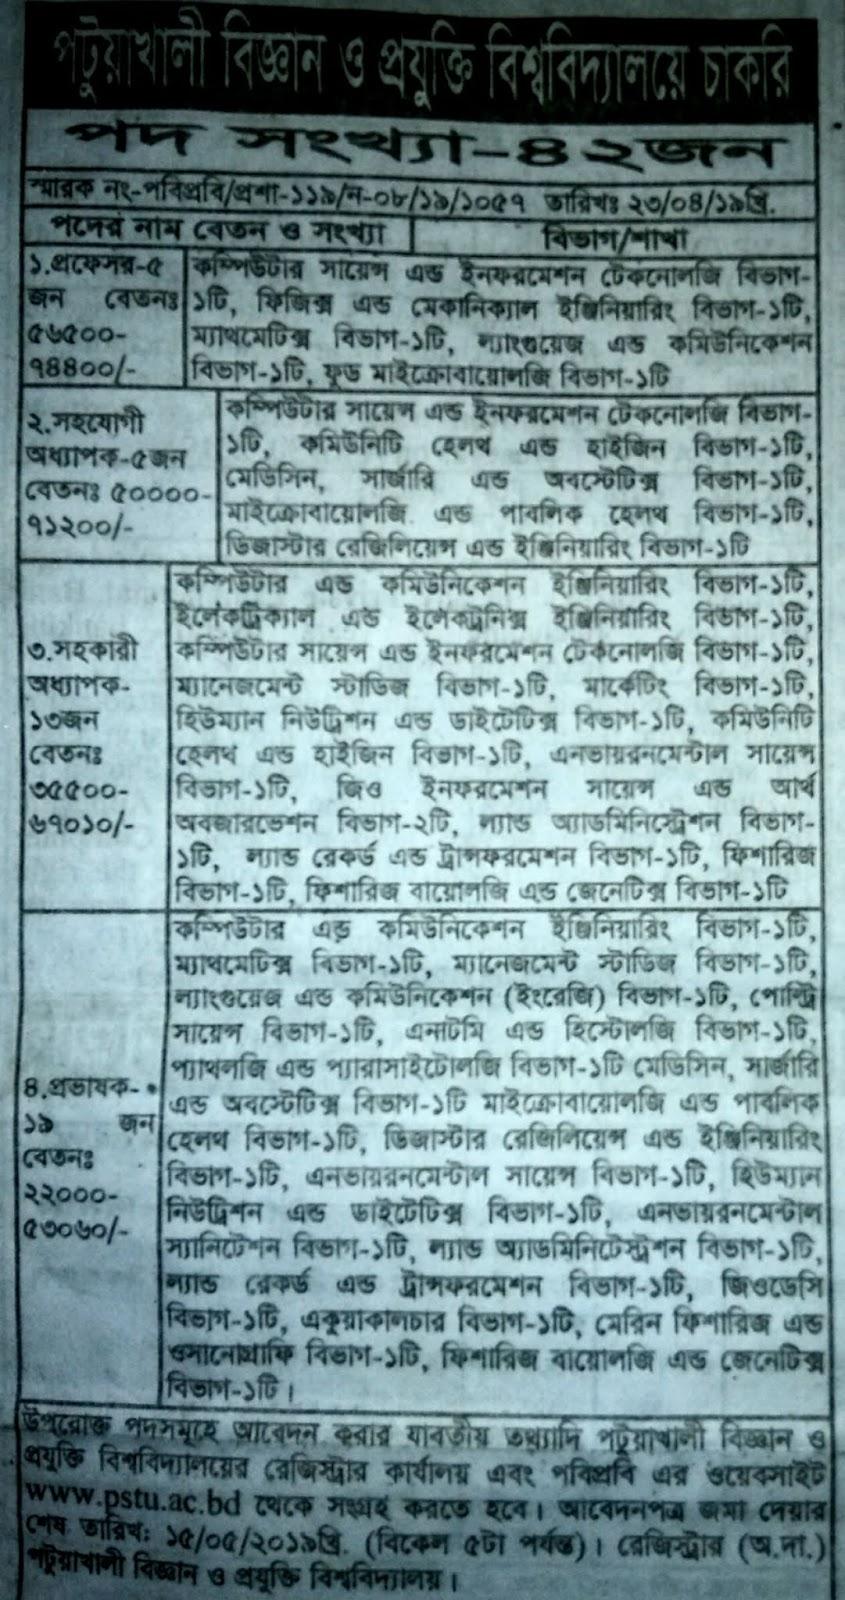 Patuakhali Science and Technology University job circular 2019. পটুয়াখালী বিজ্ঞান ও প্রযুক্তি বিশ্ববিদ্যালয় নিয়োগ বিজ্ঞপ্তি ২০১৯